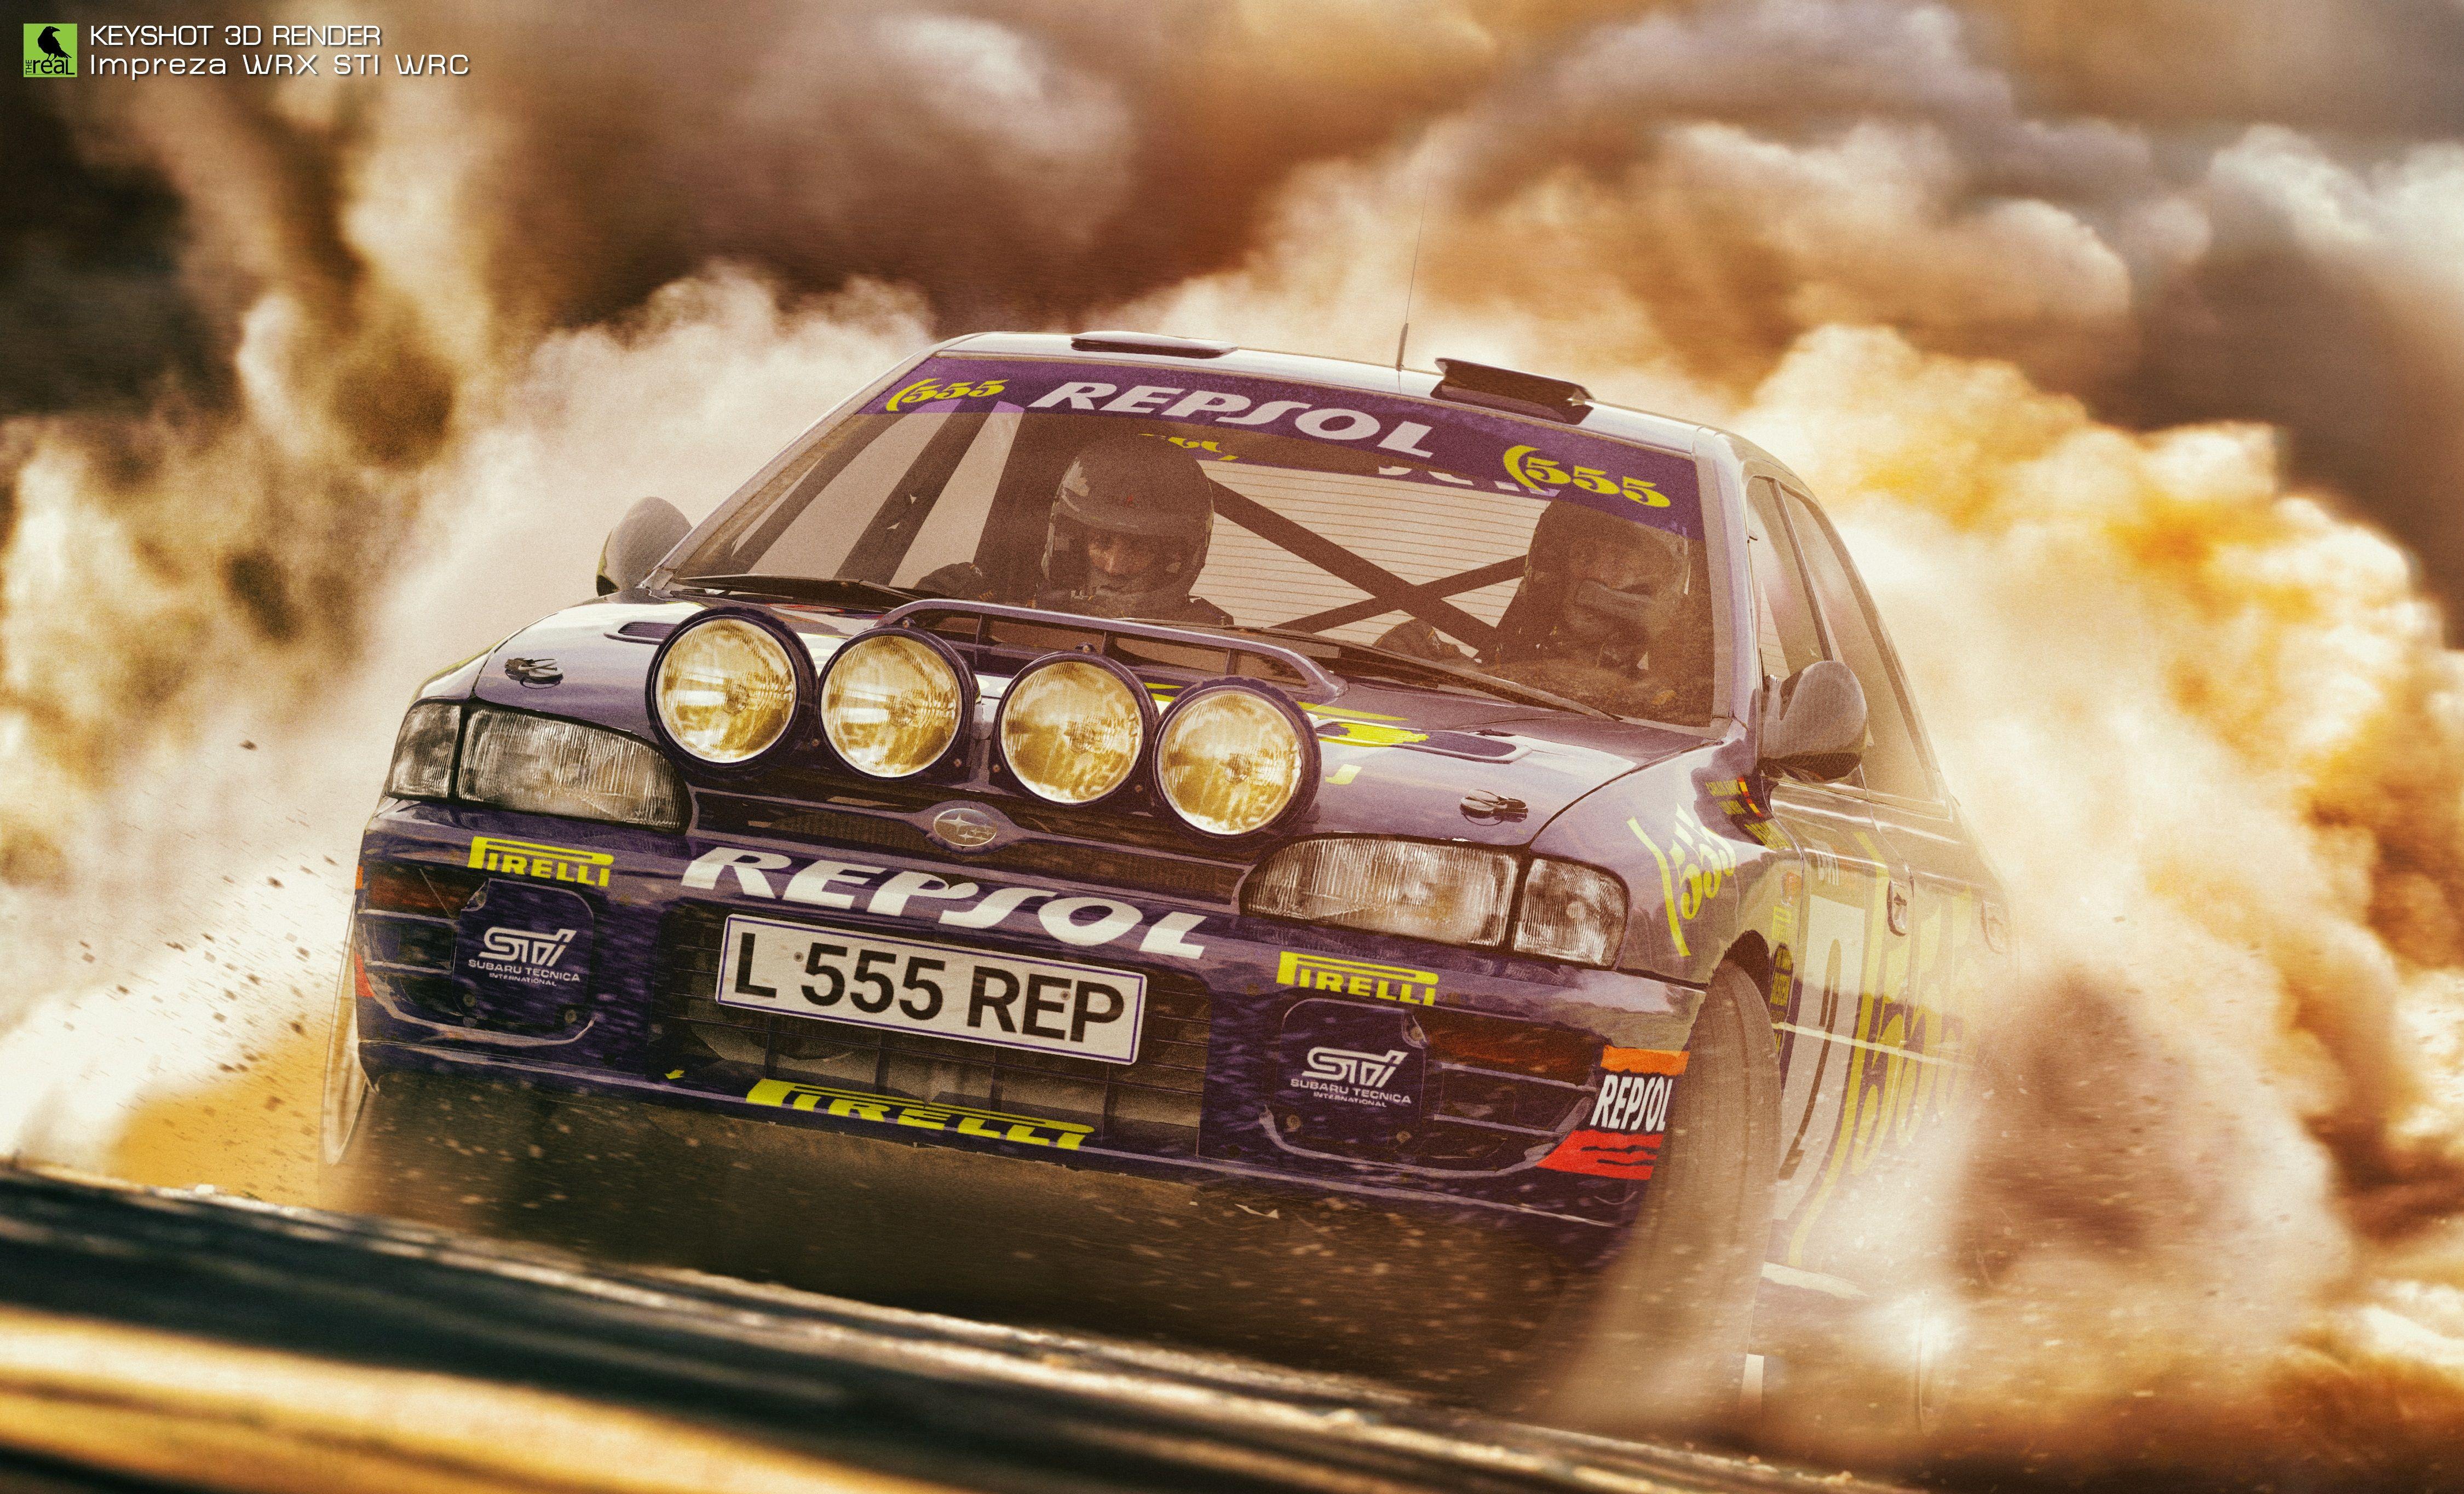 Old School Rally - Subaru WRX STI 555 WRC \'95 rendered in KeyShot by ...